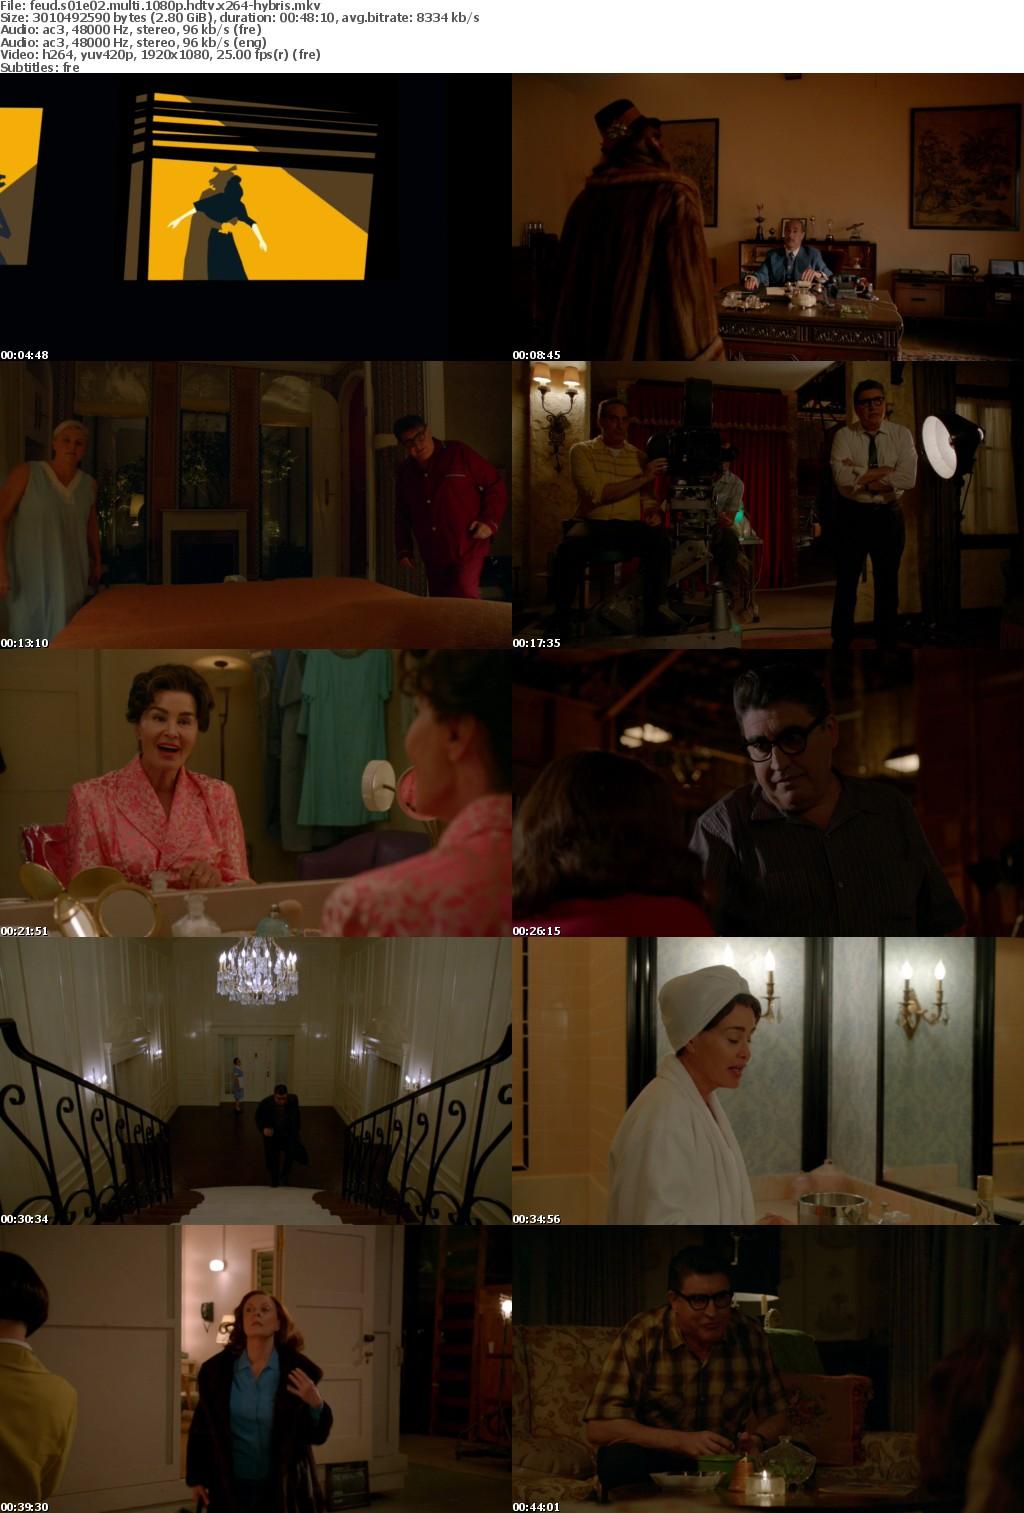 Feud S01E02 MULTi 1080p HDTV x264-HYBRiS